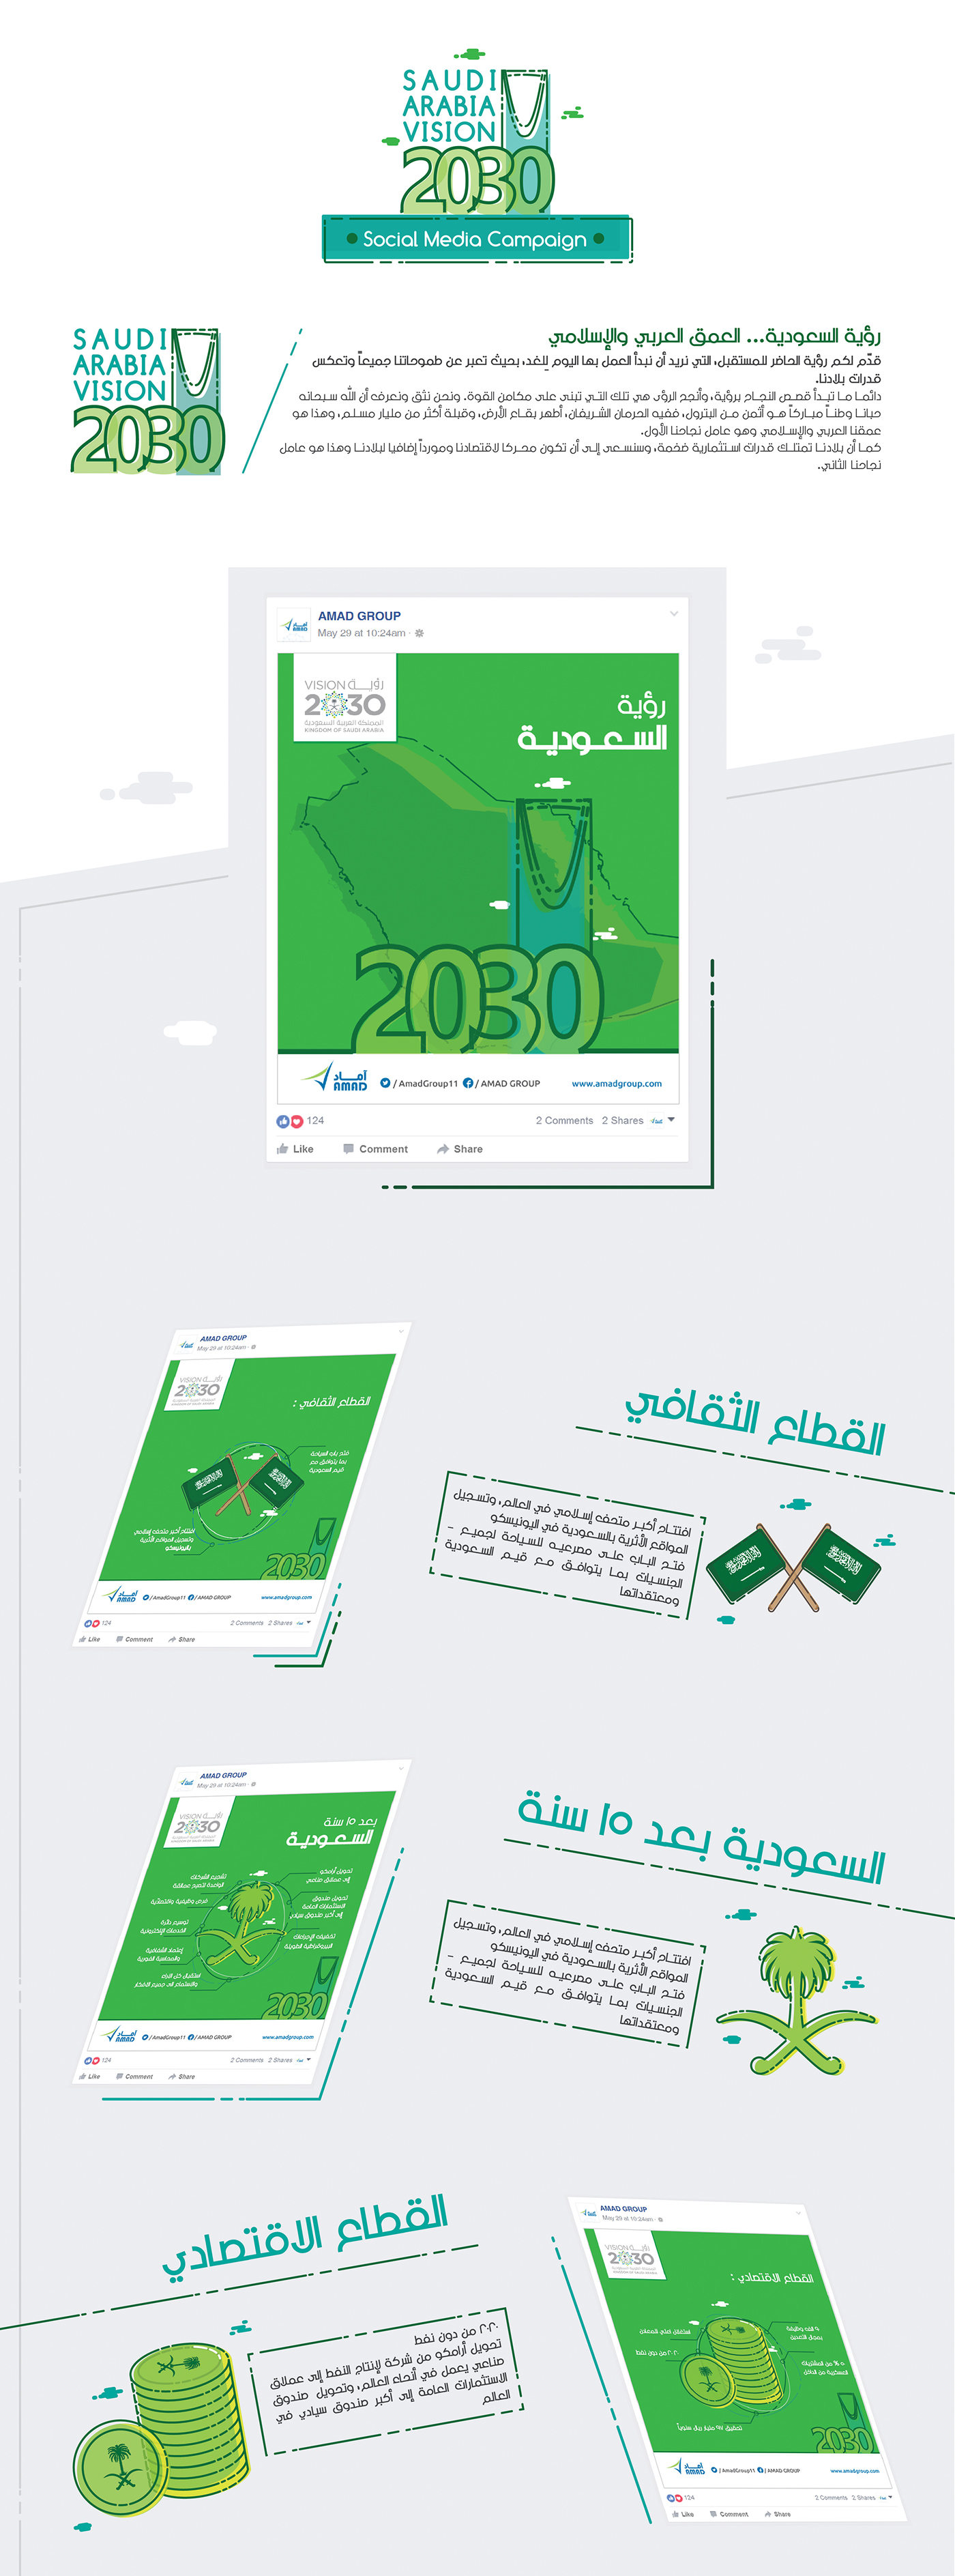 Saudi Arabia Vision 2030 Social Media Campaign - Saudi on